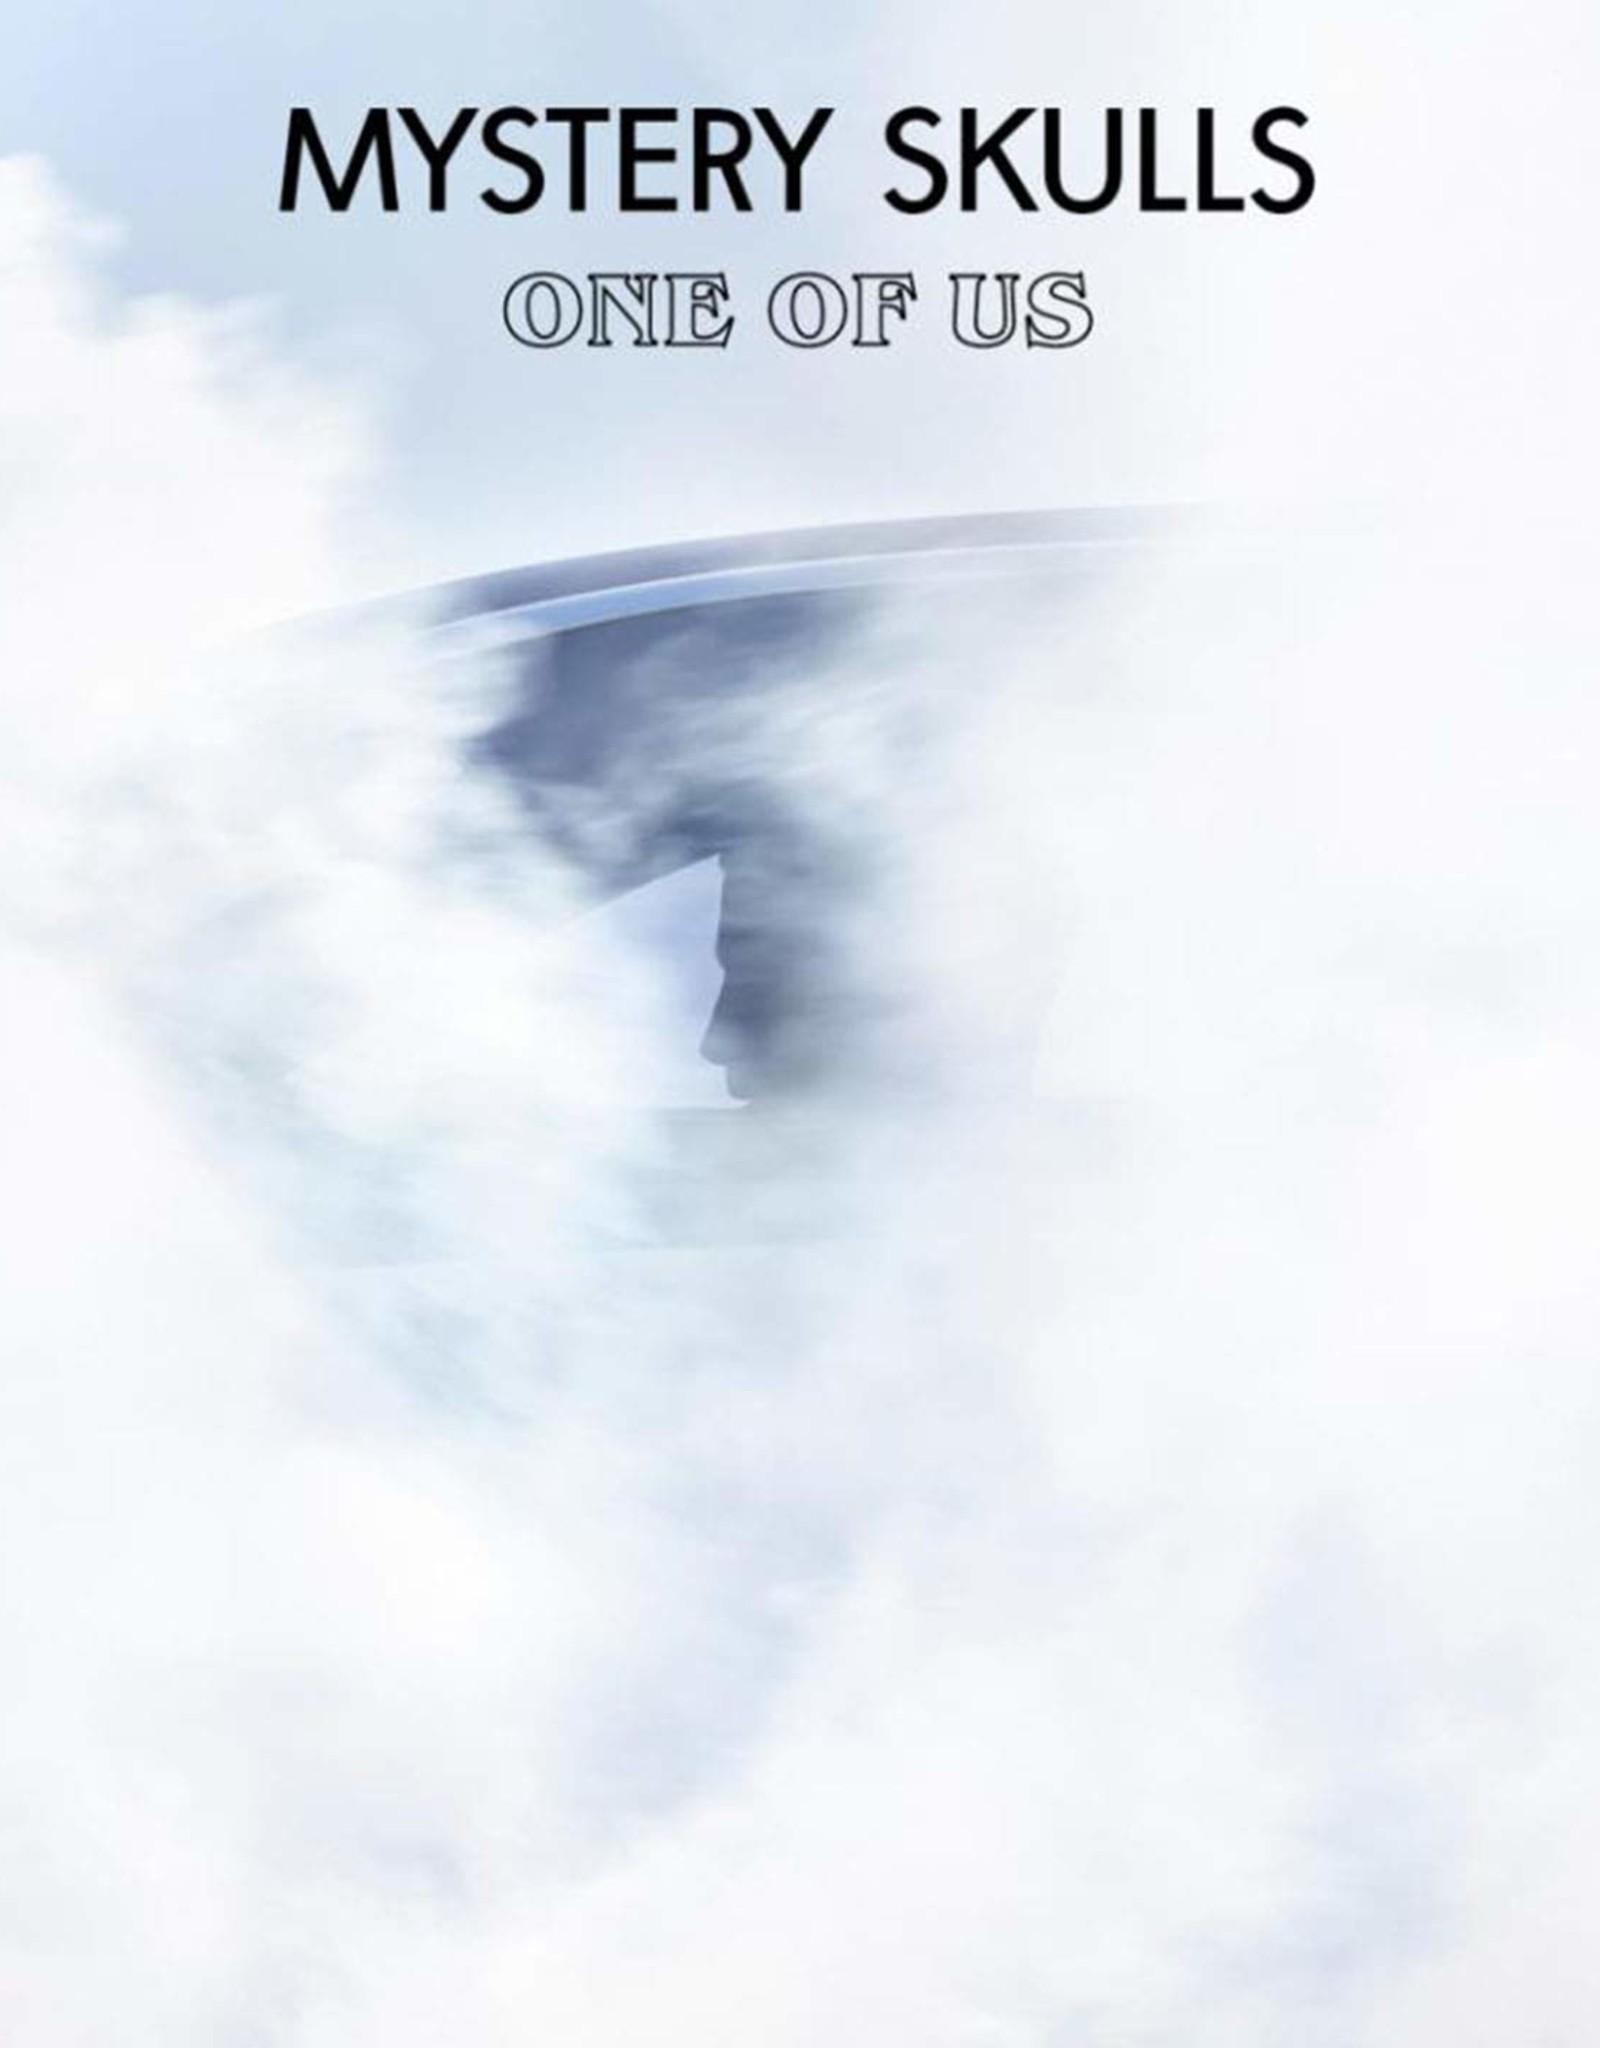 Mystery Skulls - One Of Us (Explicit)(Vinyl)